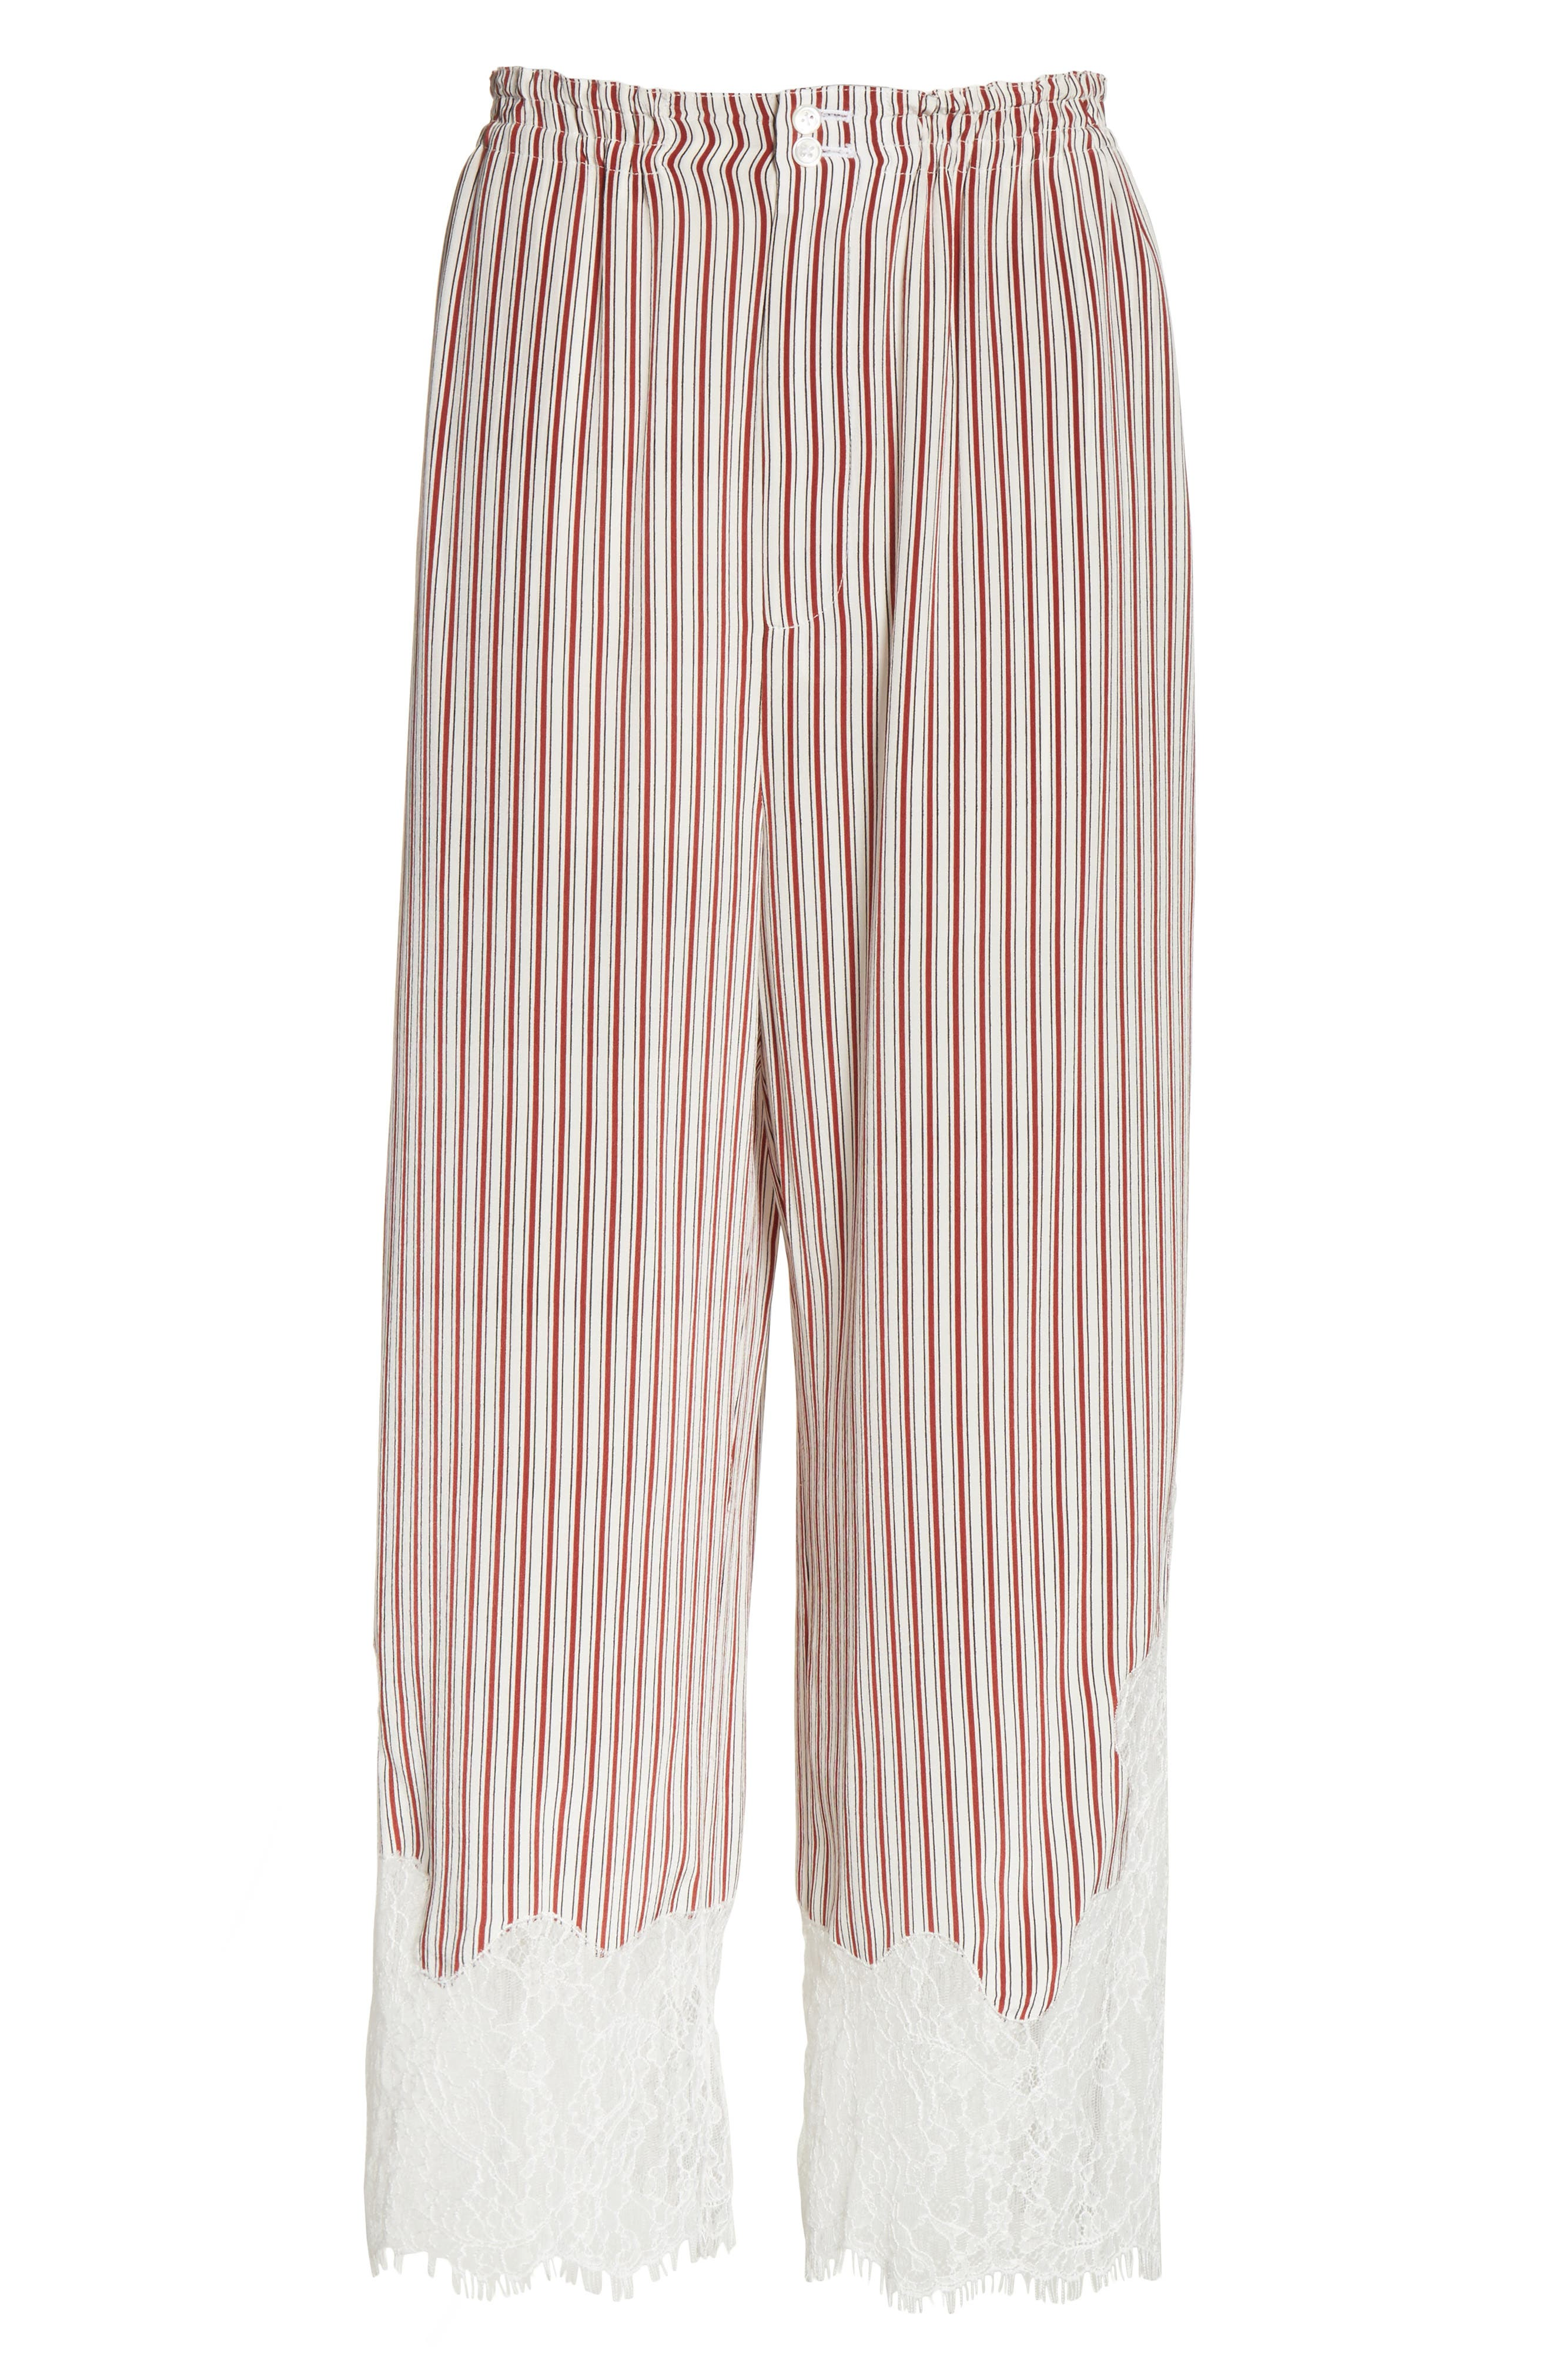 Lace Hem Stripe Pants,                             Alternate thumbnail 6, color,                             Crimson Barcode